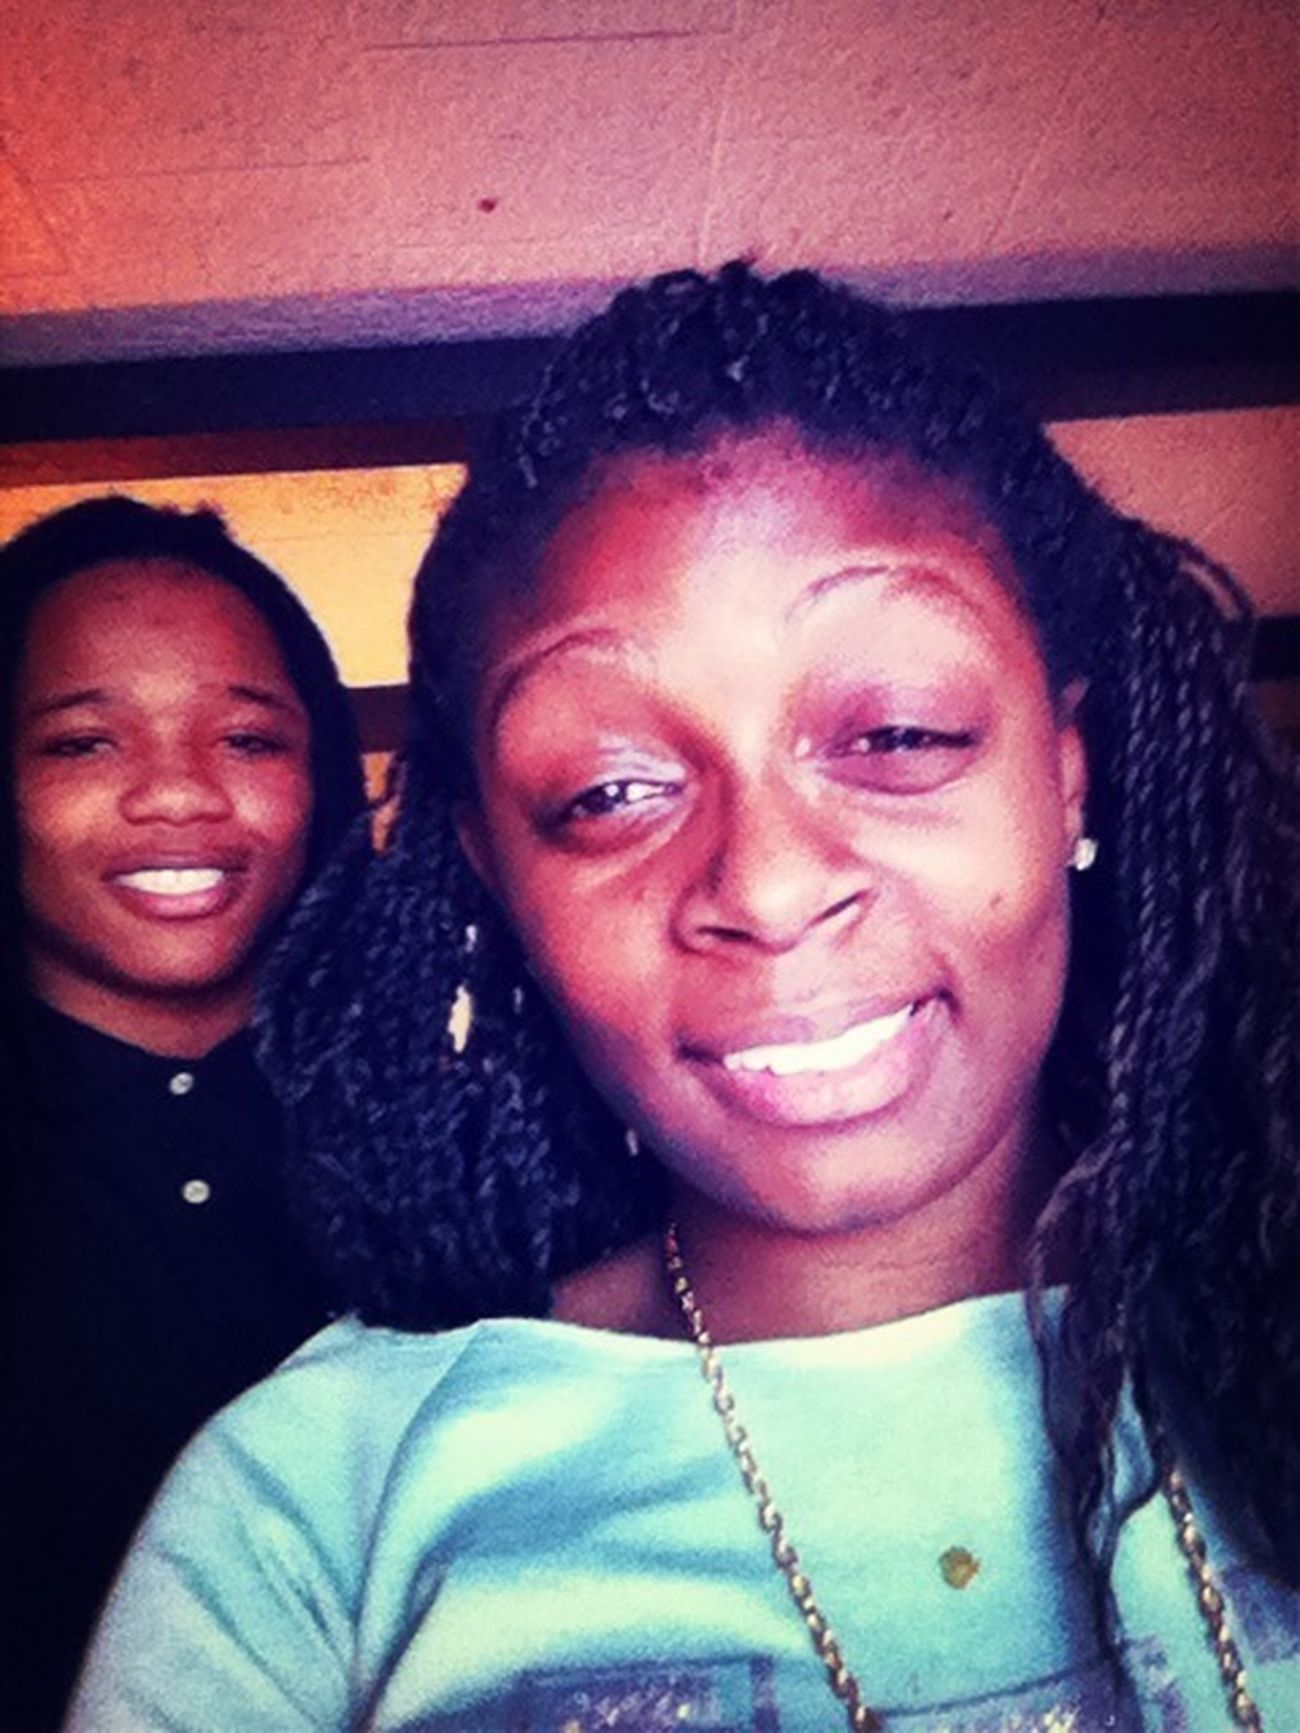 Me & My Bby !